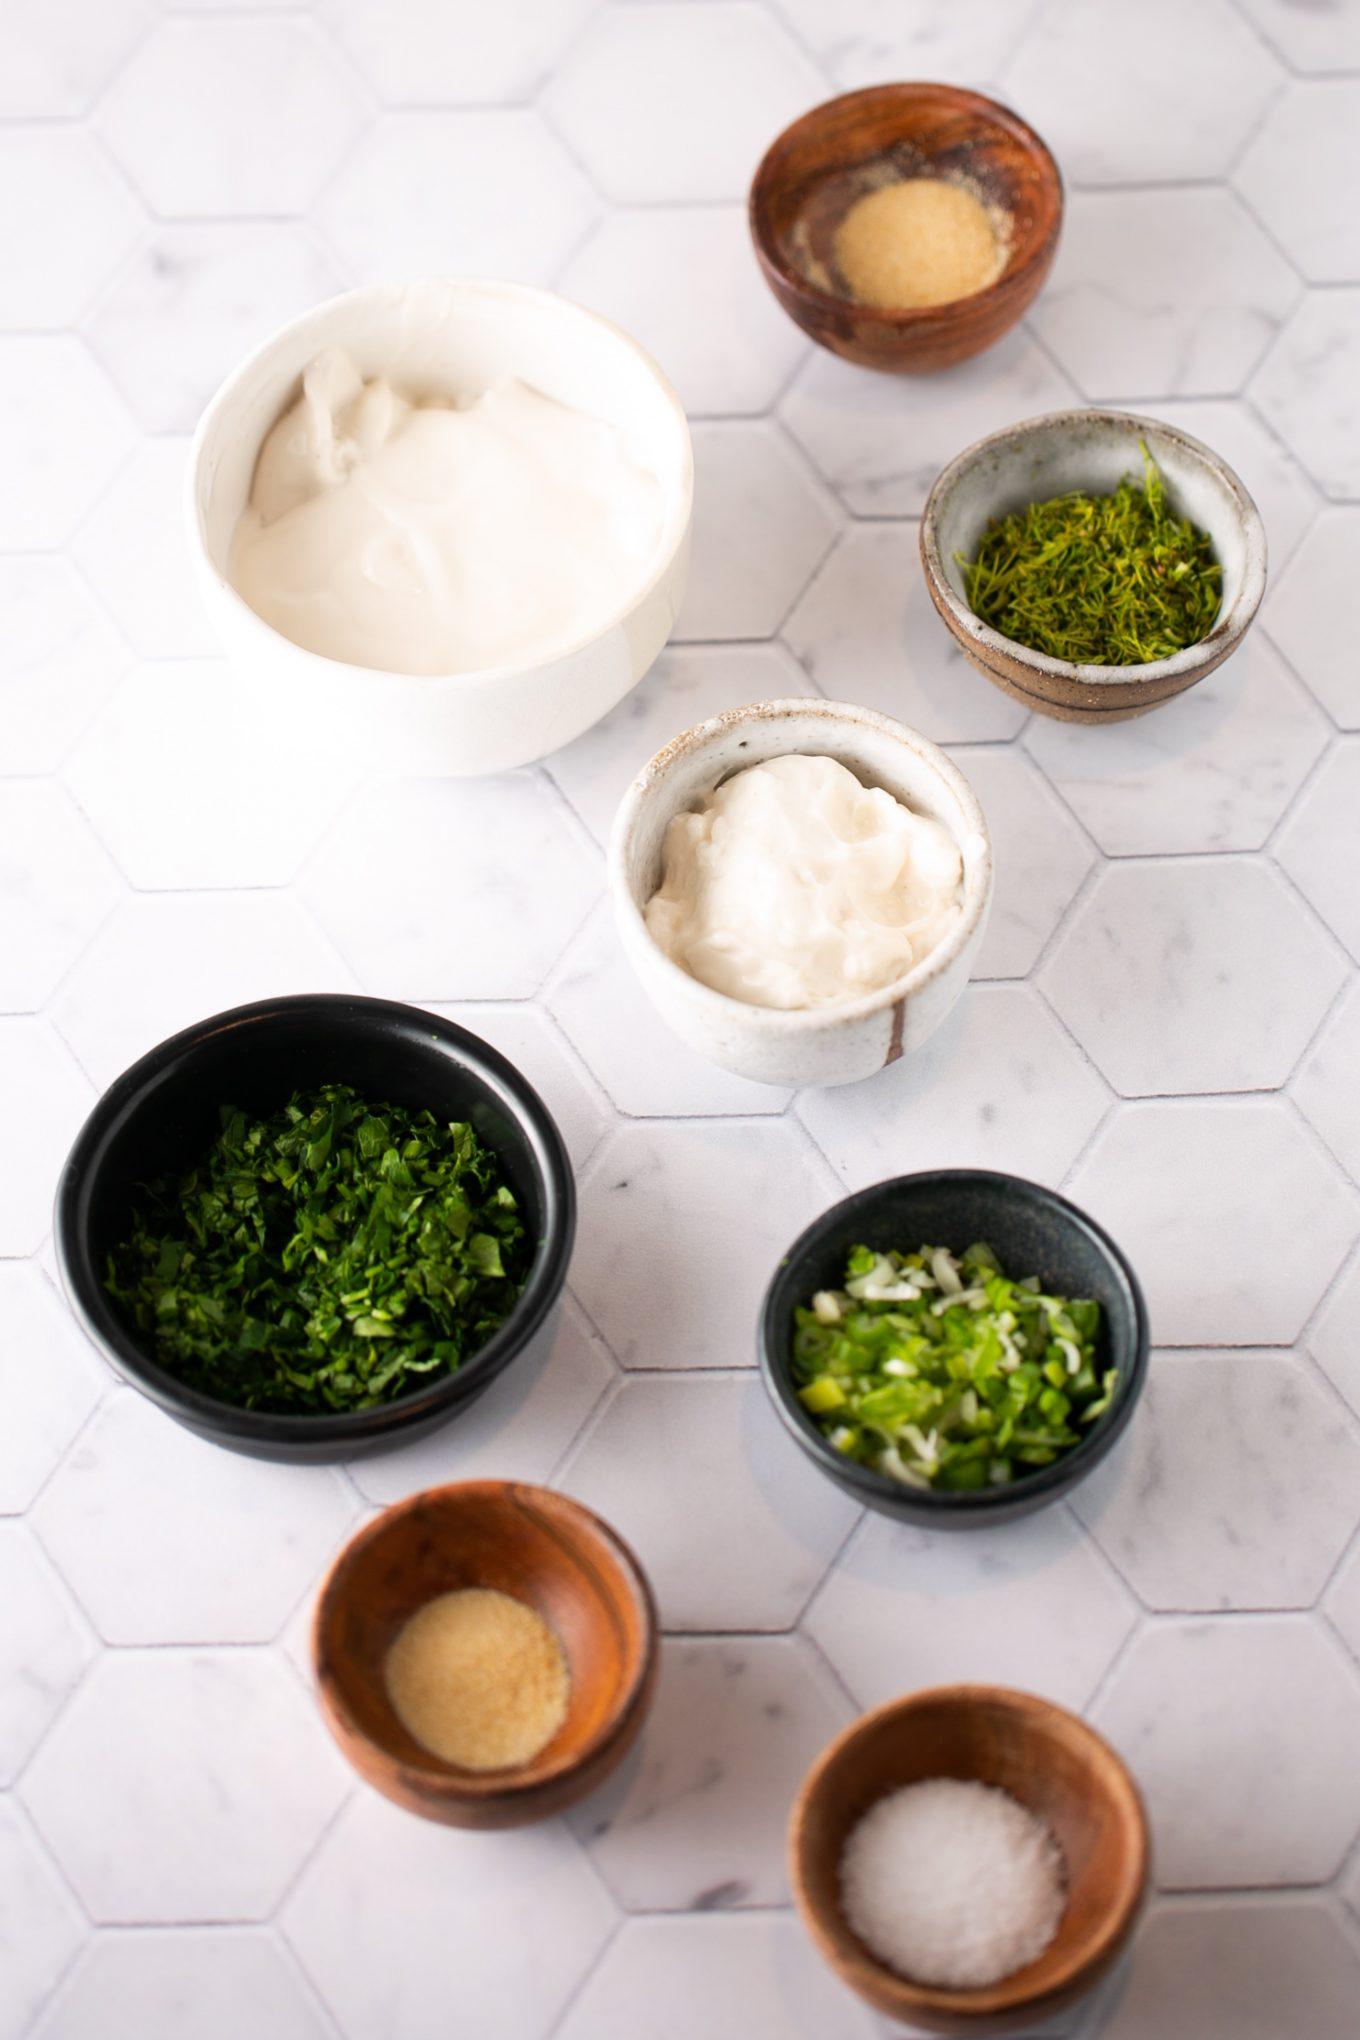 ingredientes para hacer aderezo ranch saludable